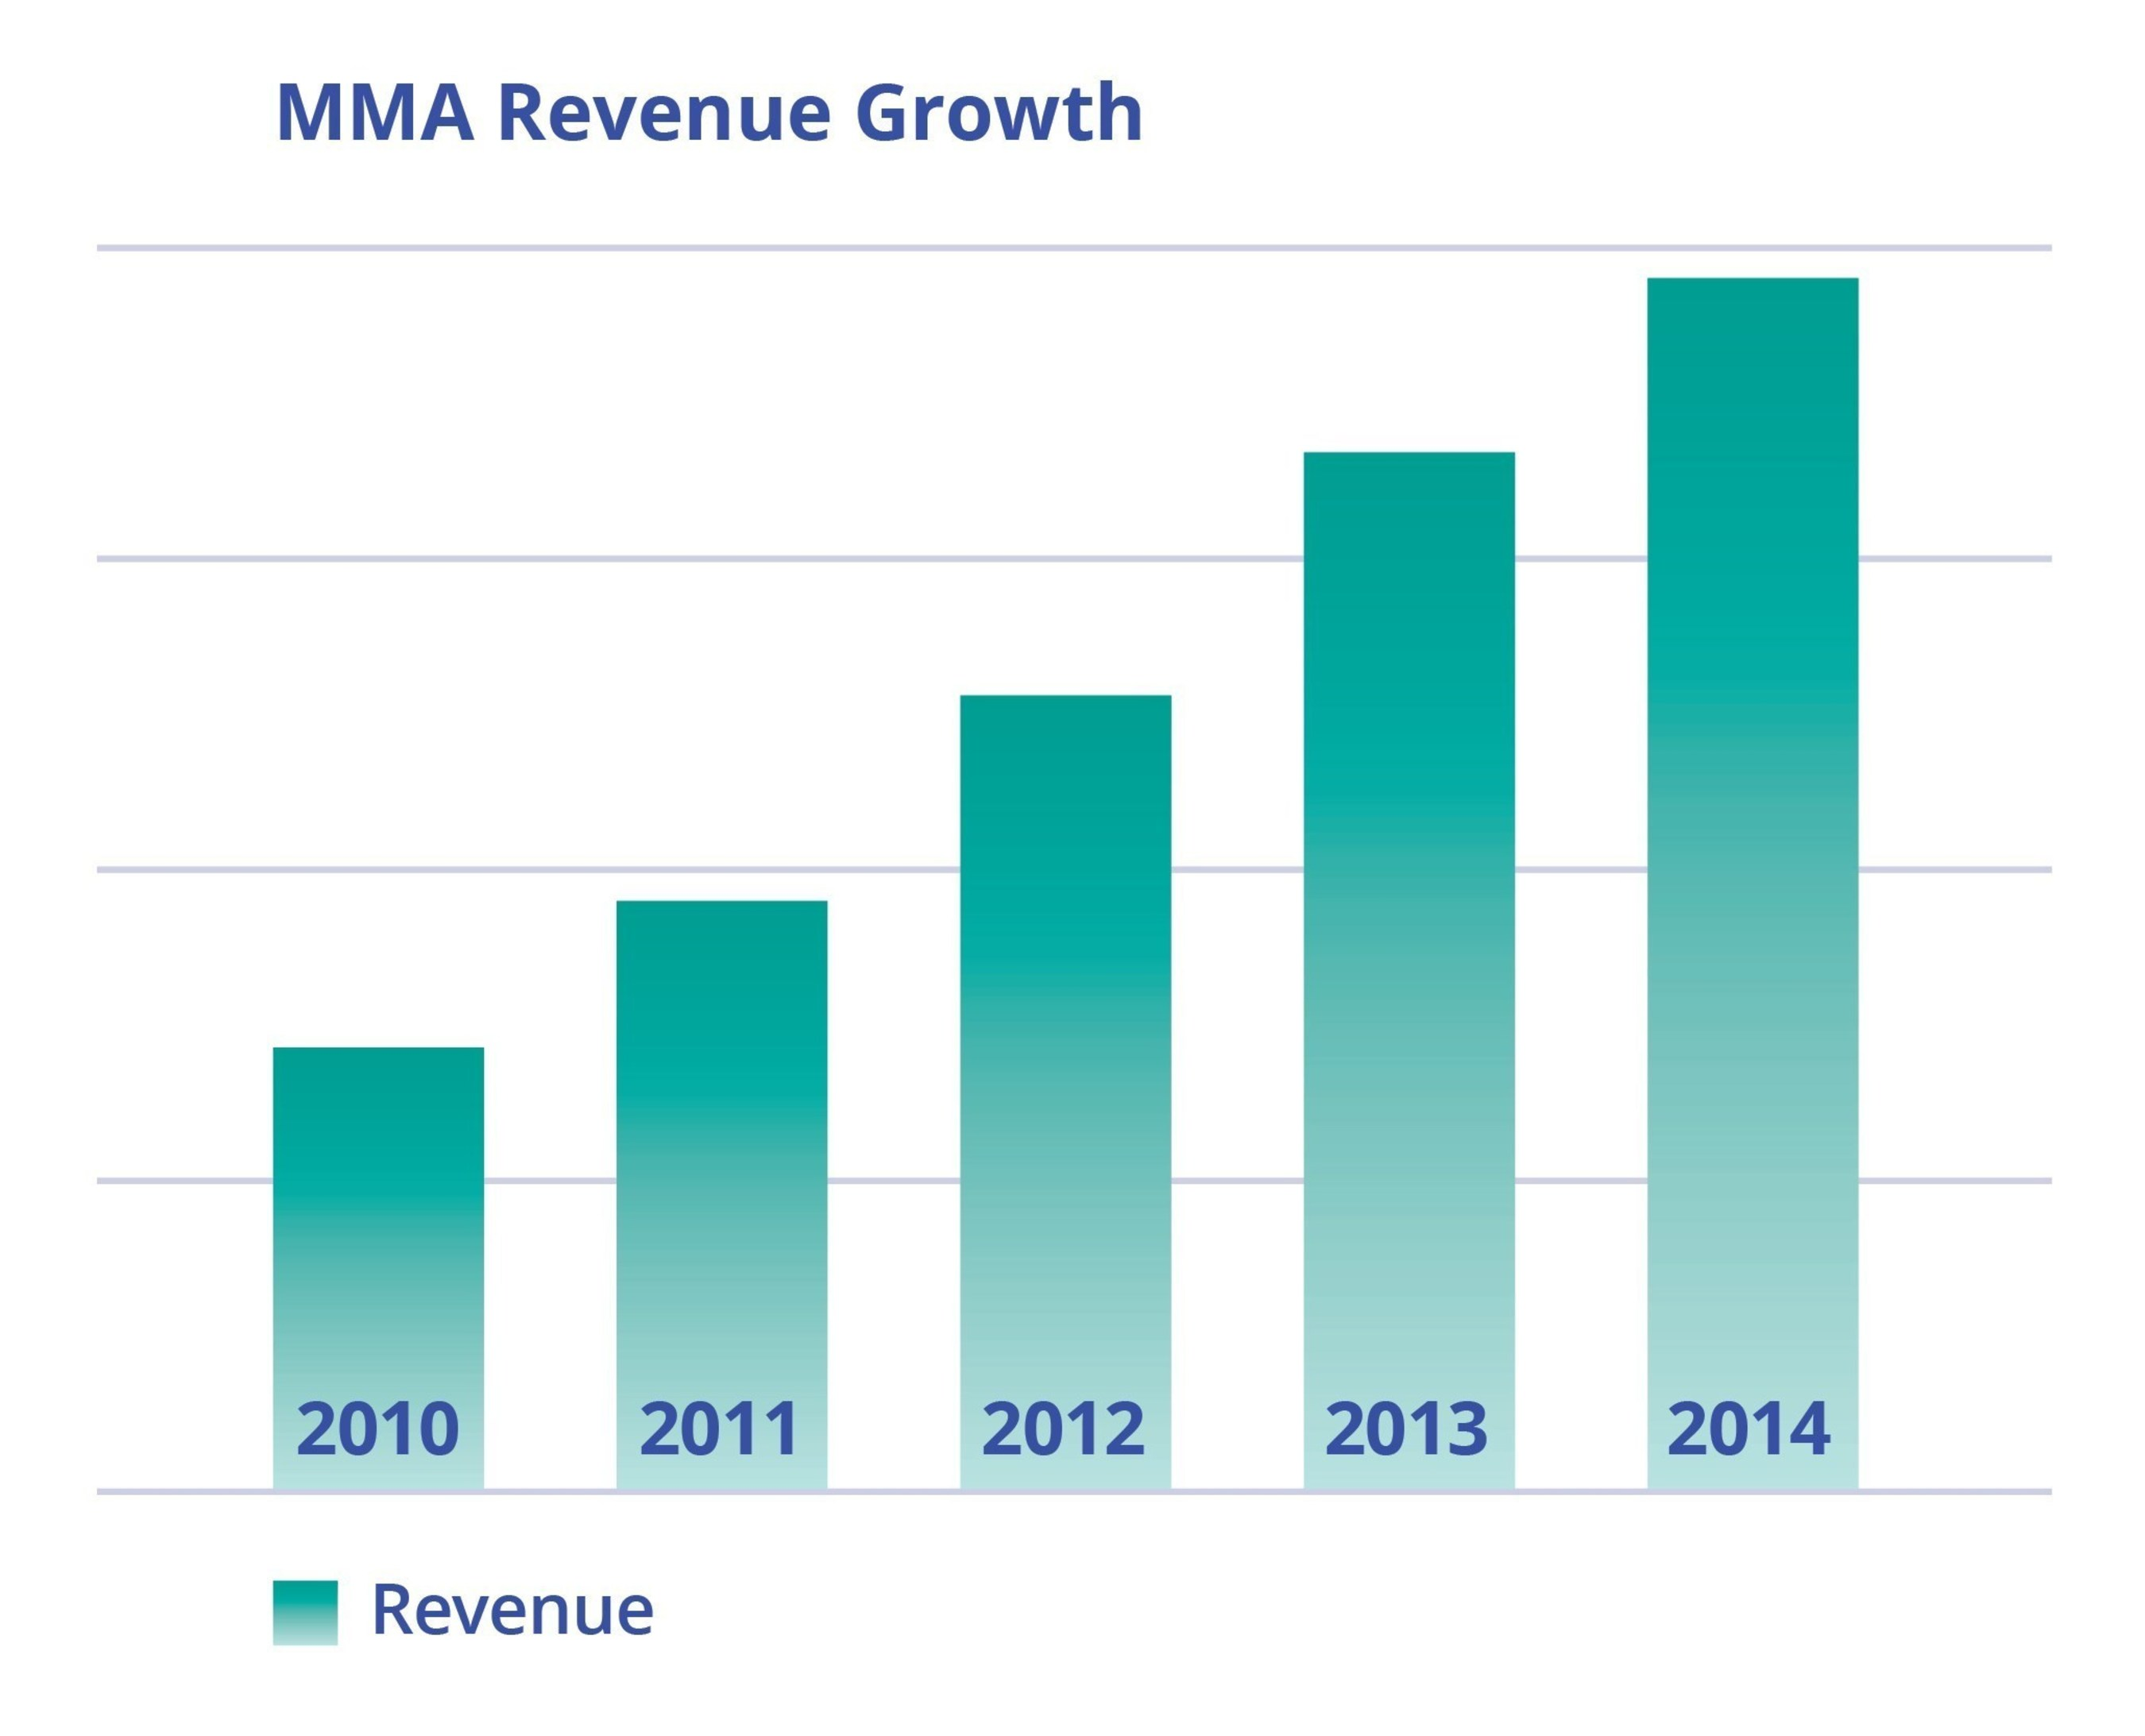 Marketing Management Analytics - Revenue Growth